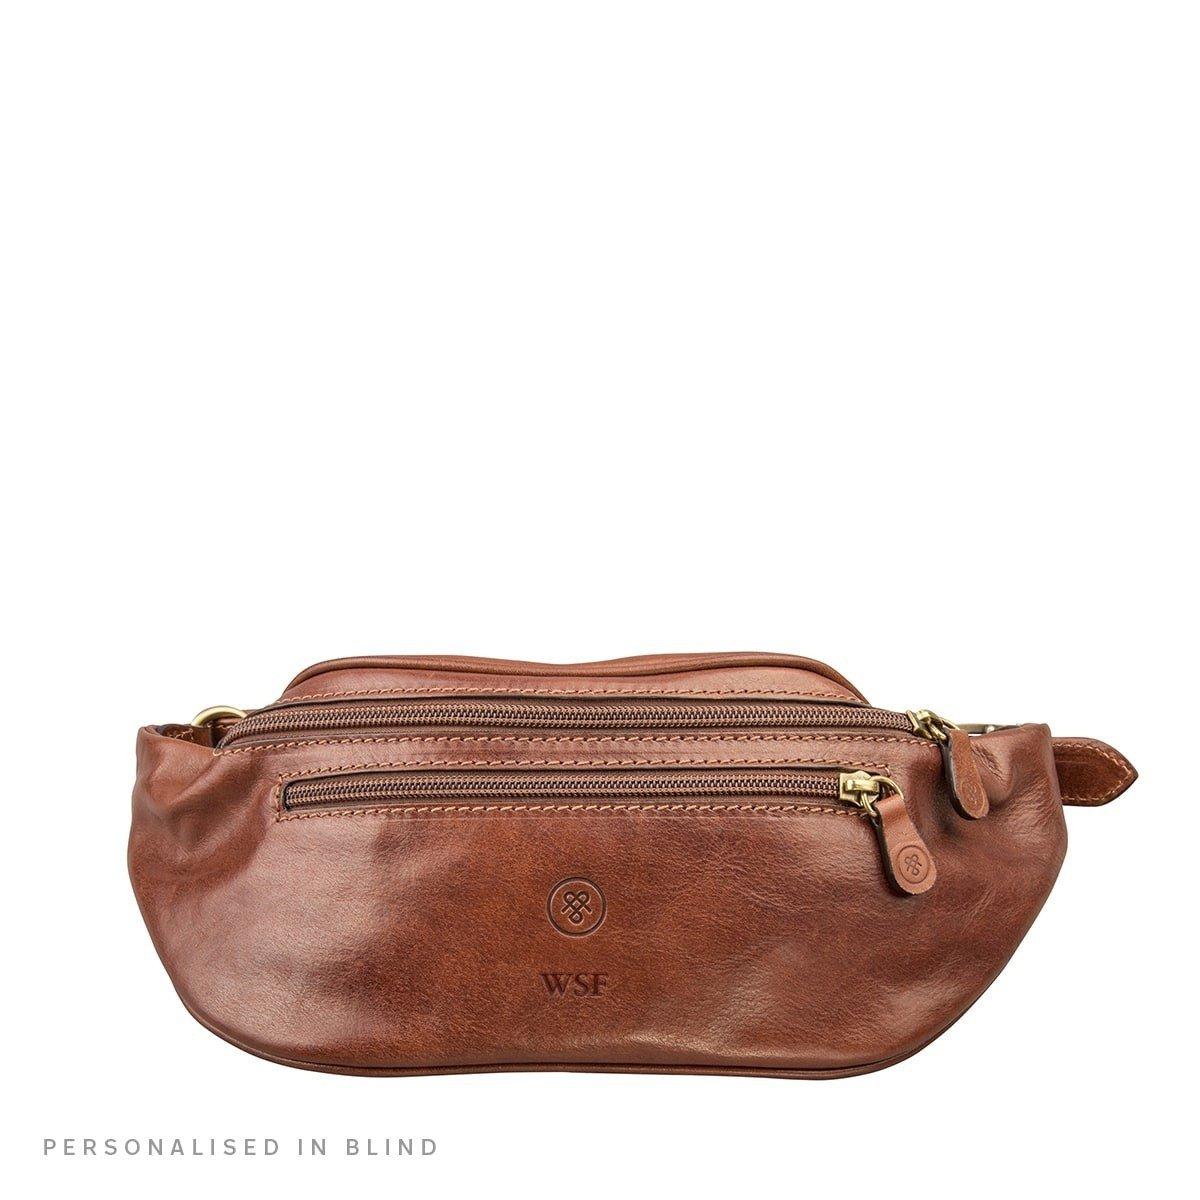 Maxwell Scott Personalized Premium Quality Leather Bum Bag (Centolla)